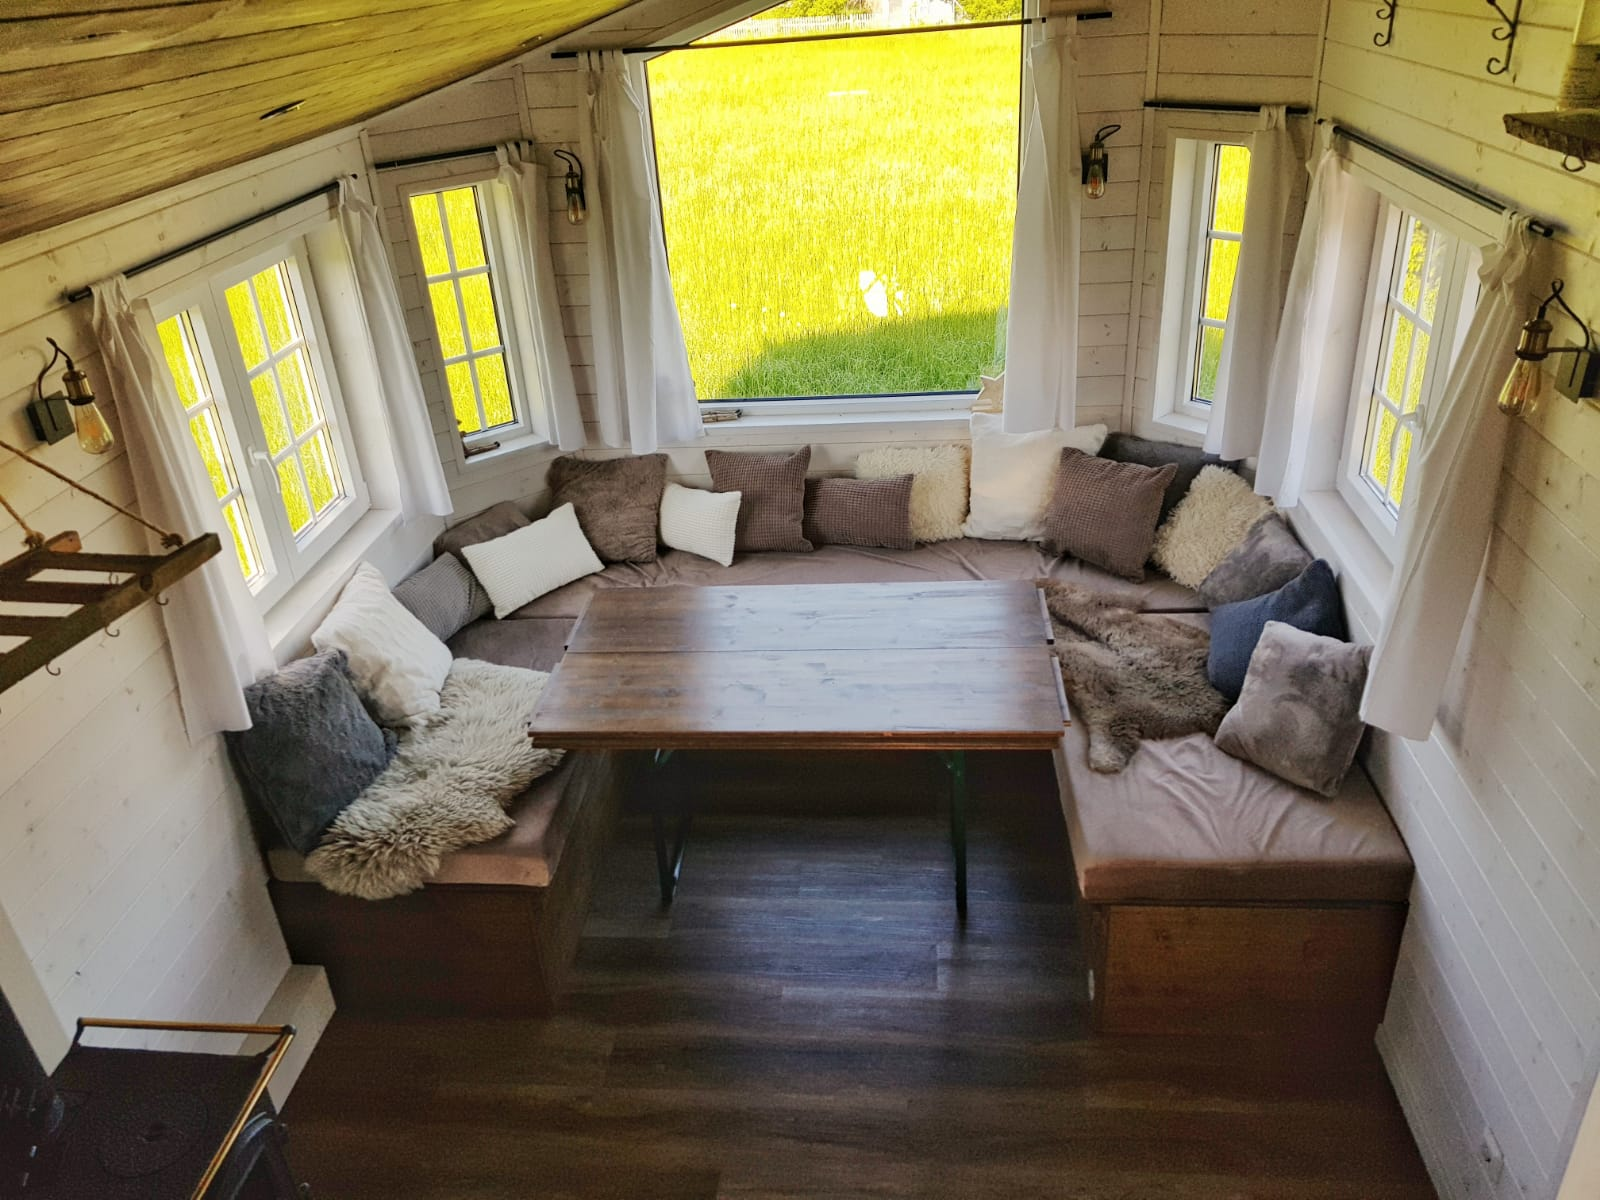 gebautes chalet-vital-camp-gmbh08